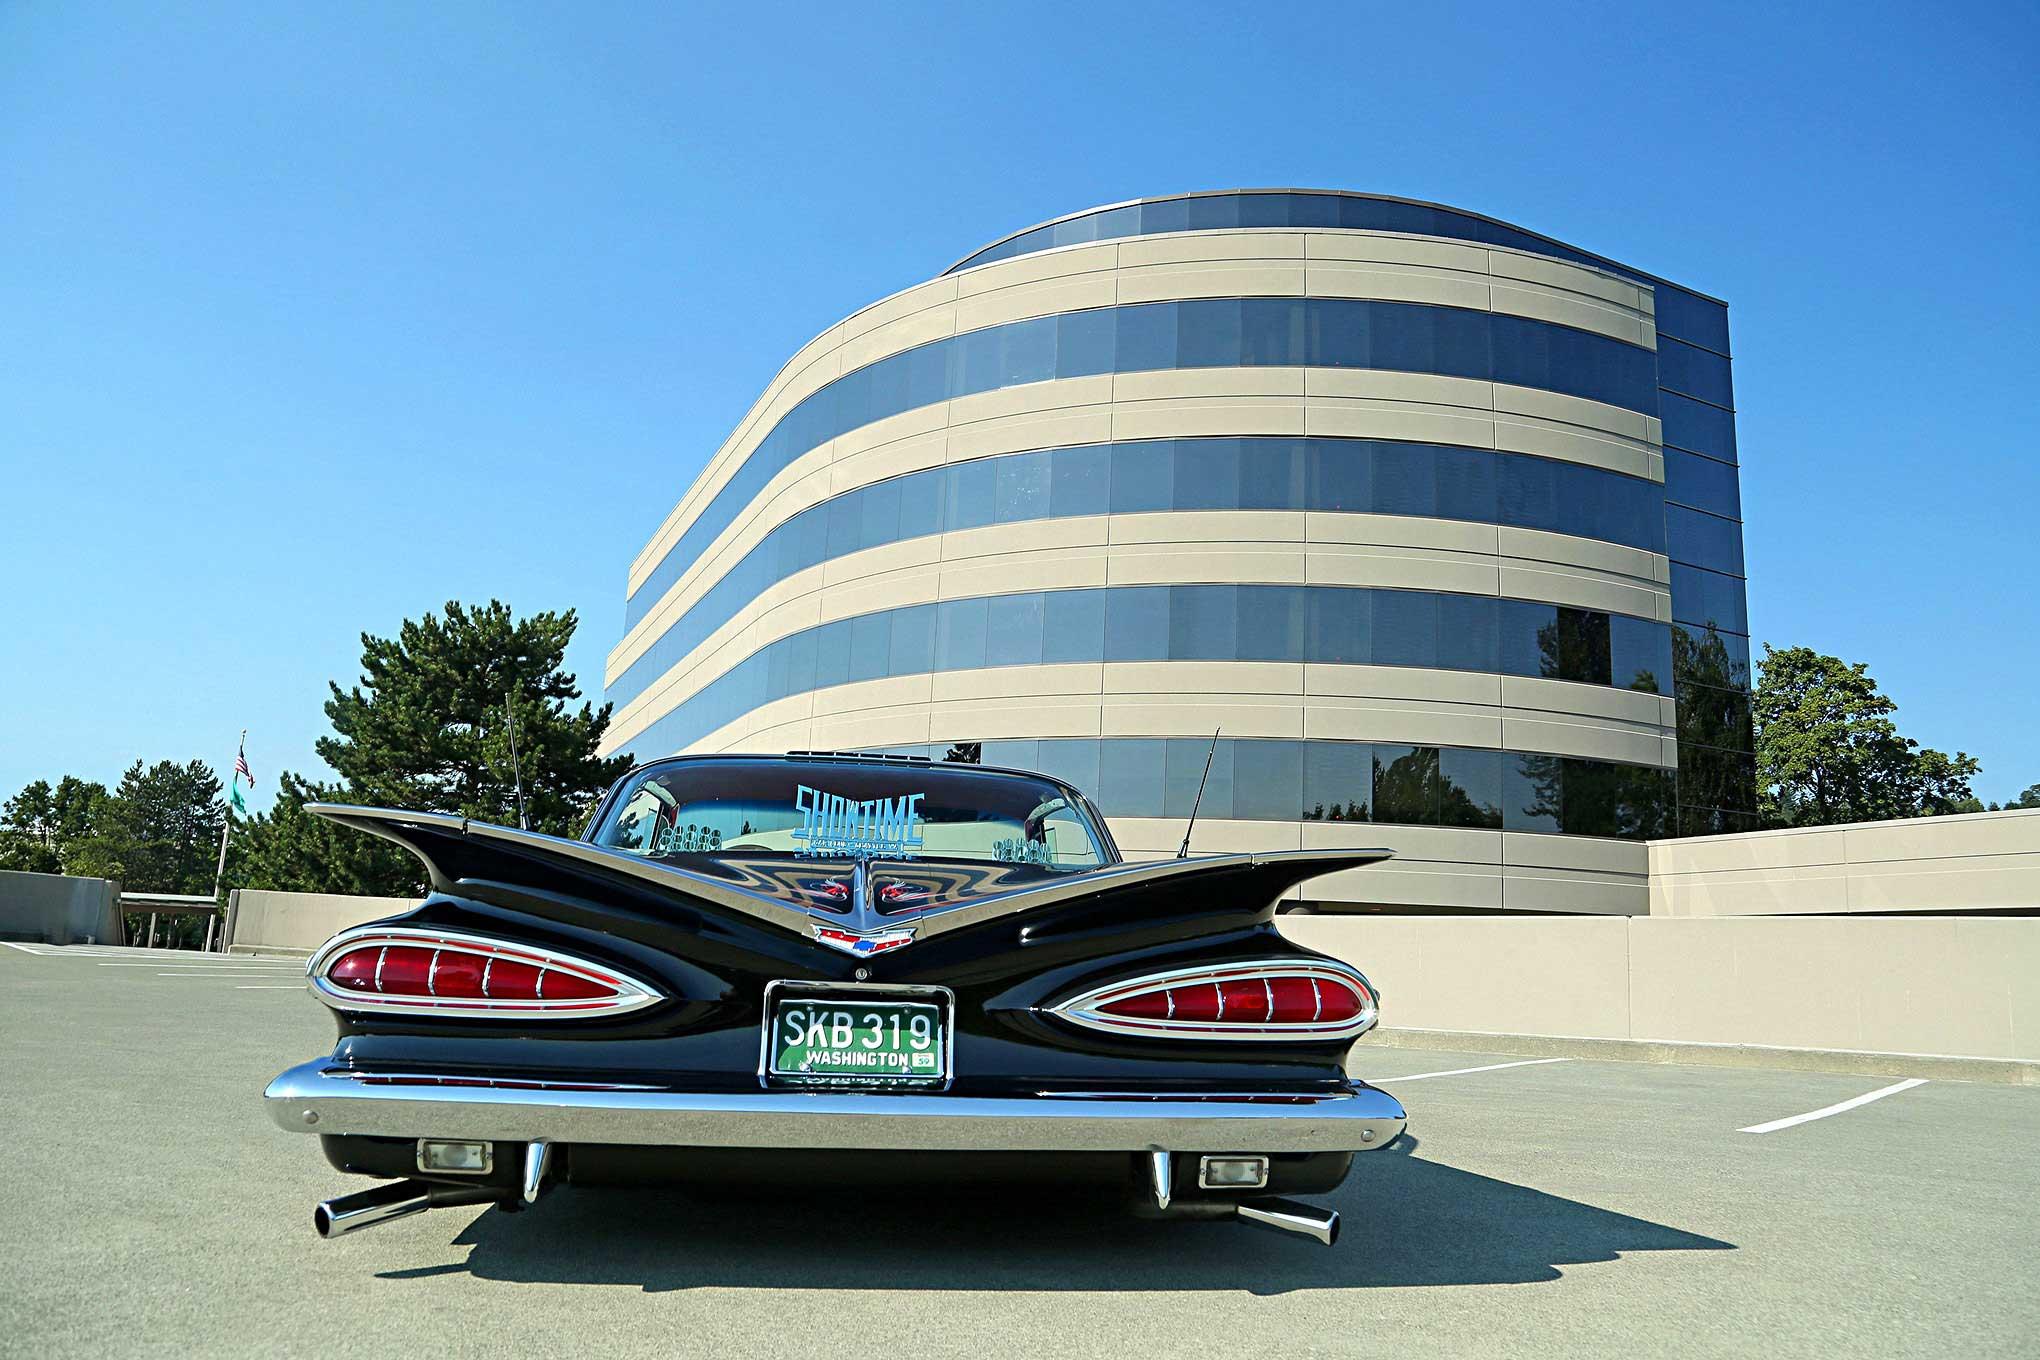 1959 Chevrolet Impala Og 59 Chevy Rear Wiring Harness 17 37